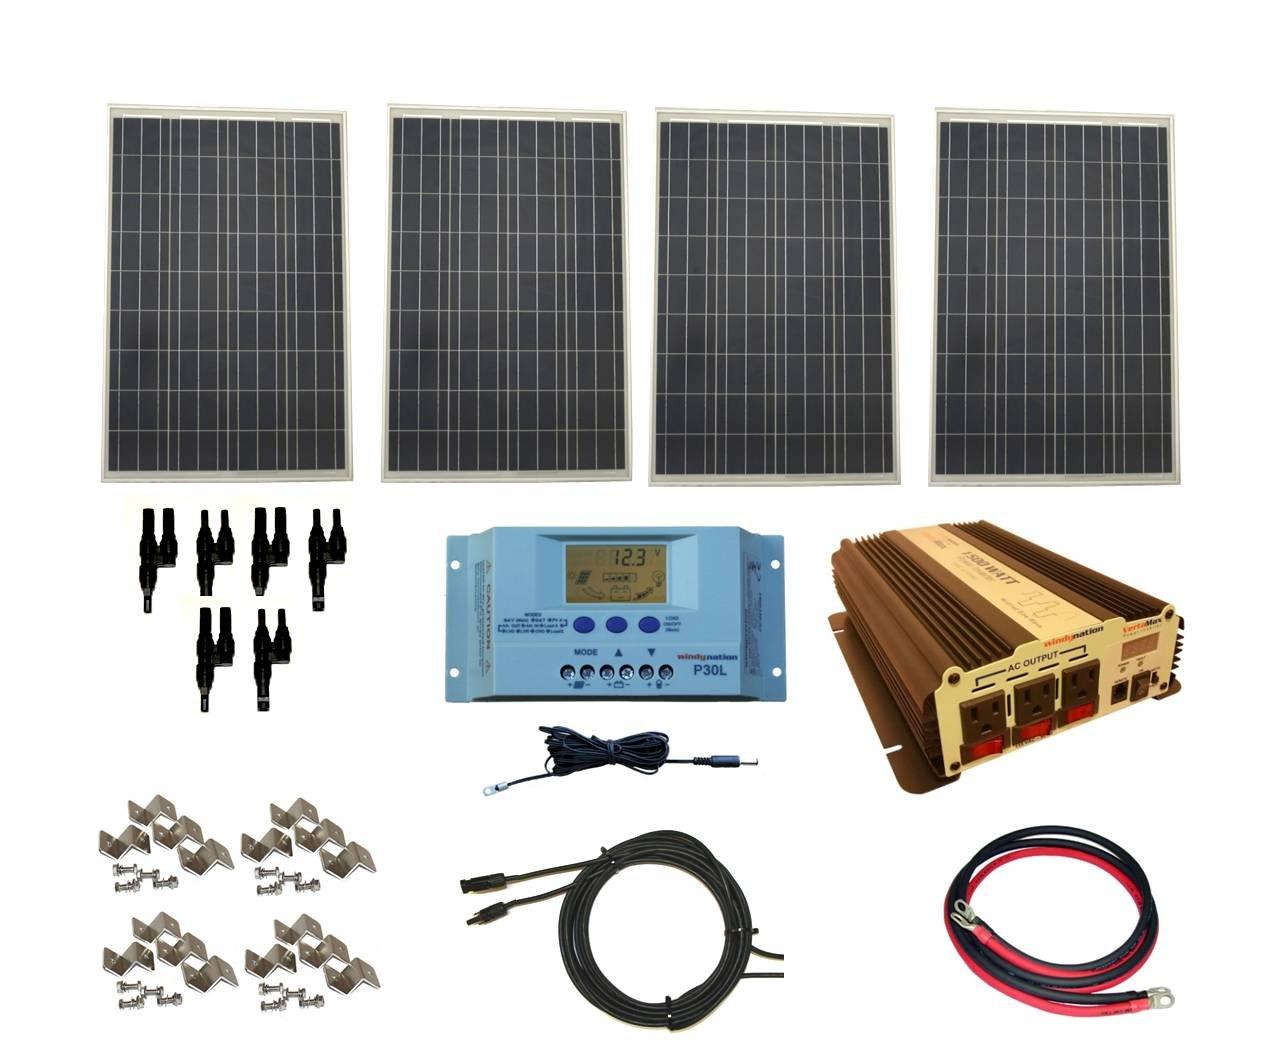 WindyNation Complete 400 Watt Solar Panel Kit with 1500 Watt VertaMax Power Inverter RV, Boat, Off-Grid 12 Volt Battery